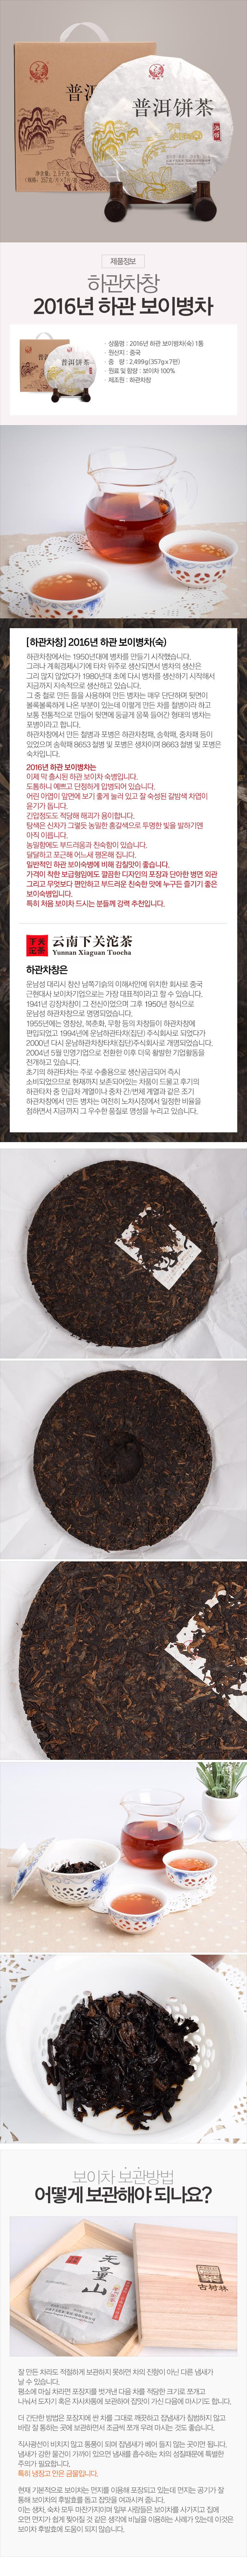 [ HagwanChaChang ] [ D ]4 [ HAGWANCHACHANG ] 2016 Hagwan Boibyeong 茶 1头条 357g x 7p)